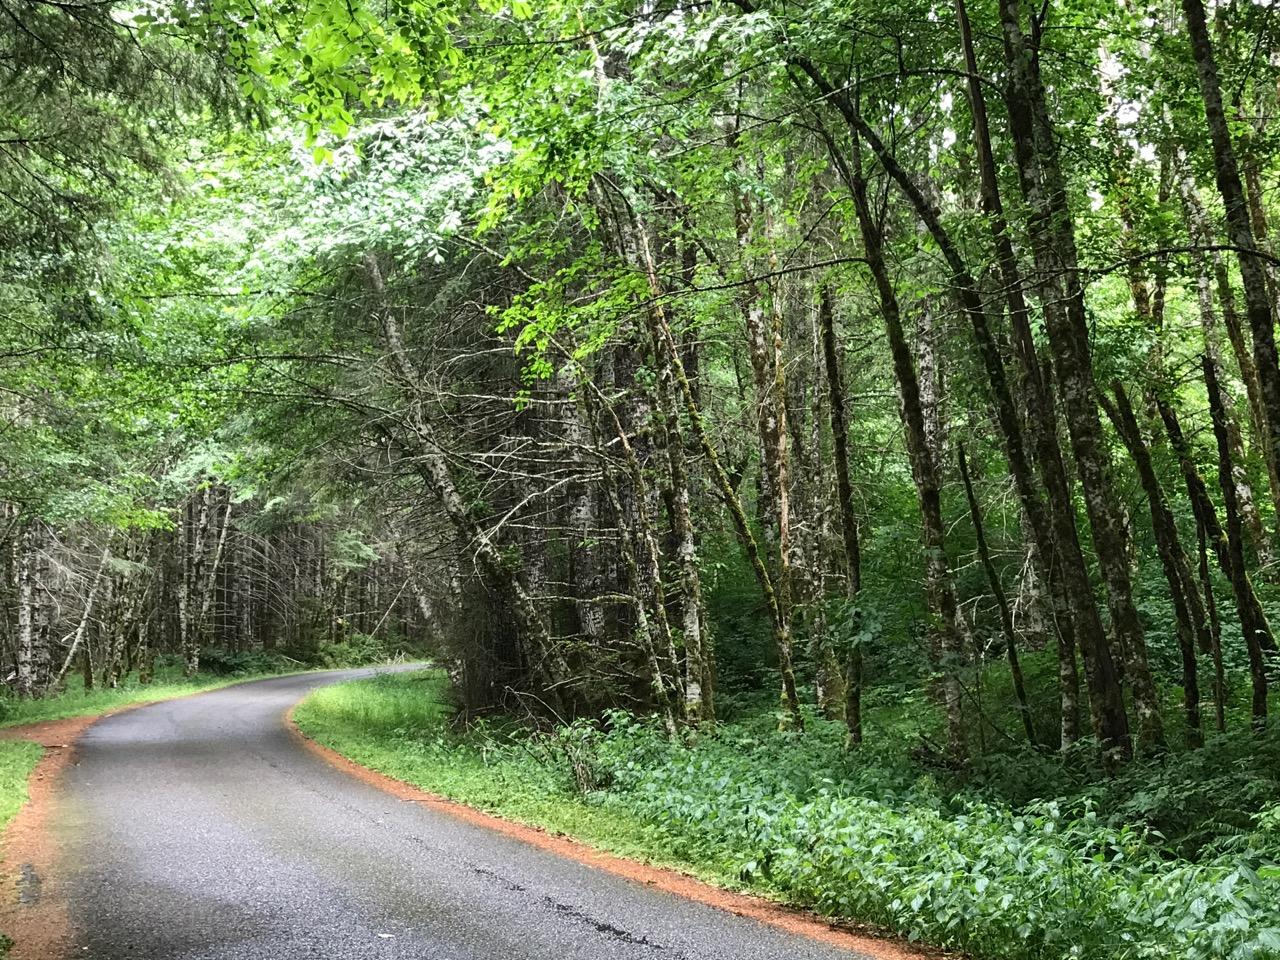 Detour to Tillamook